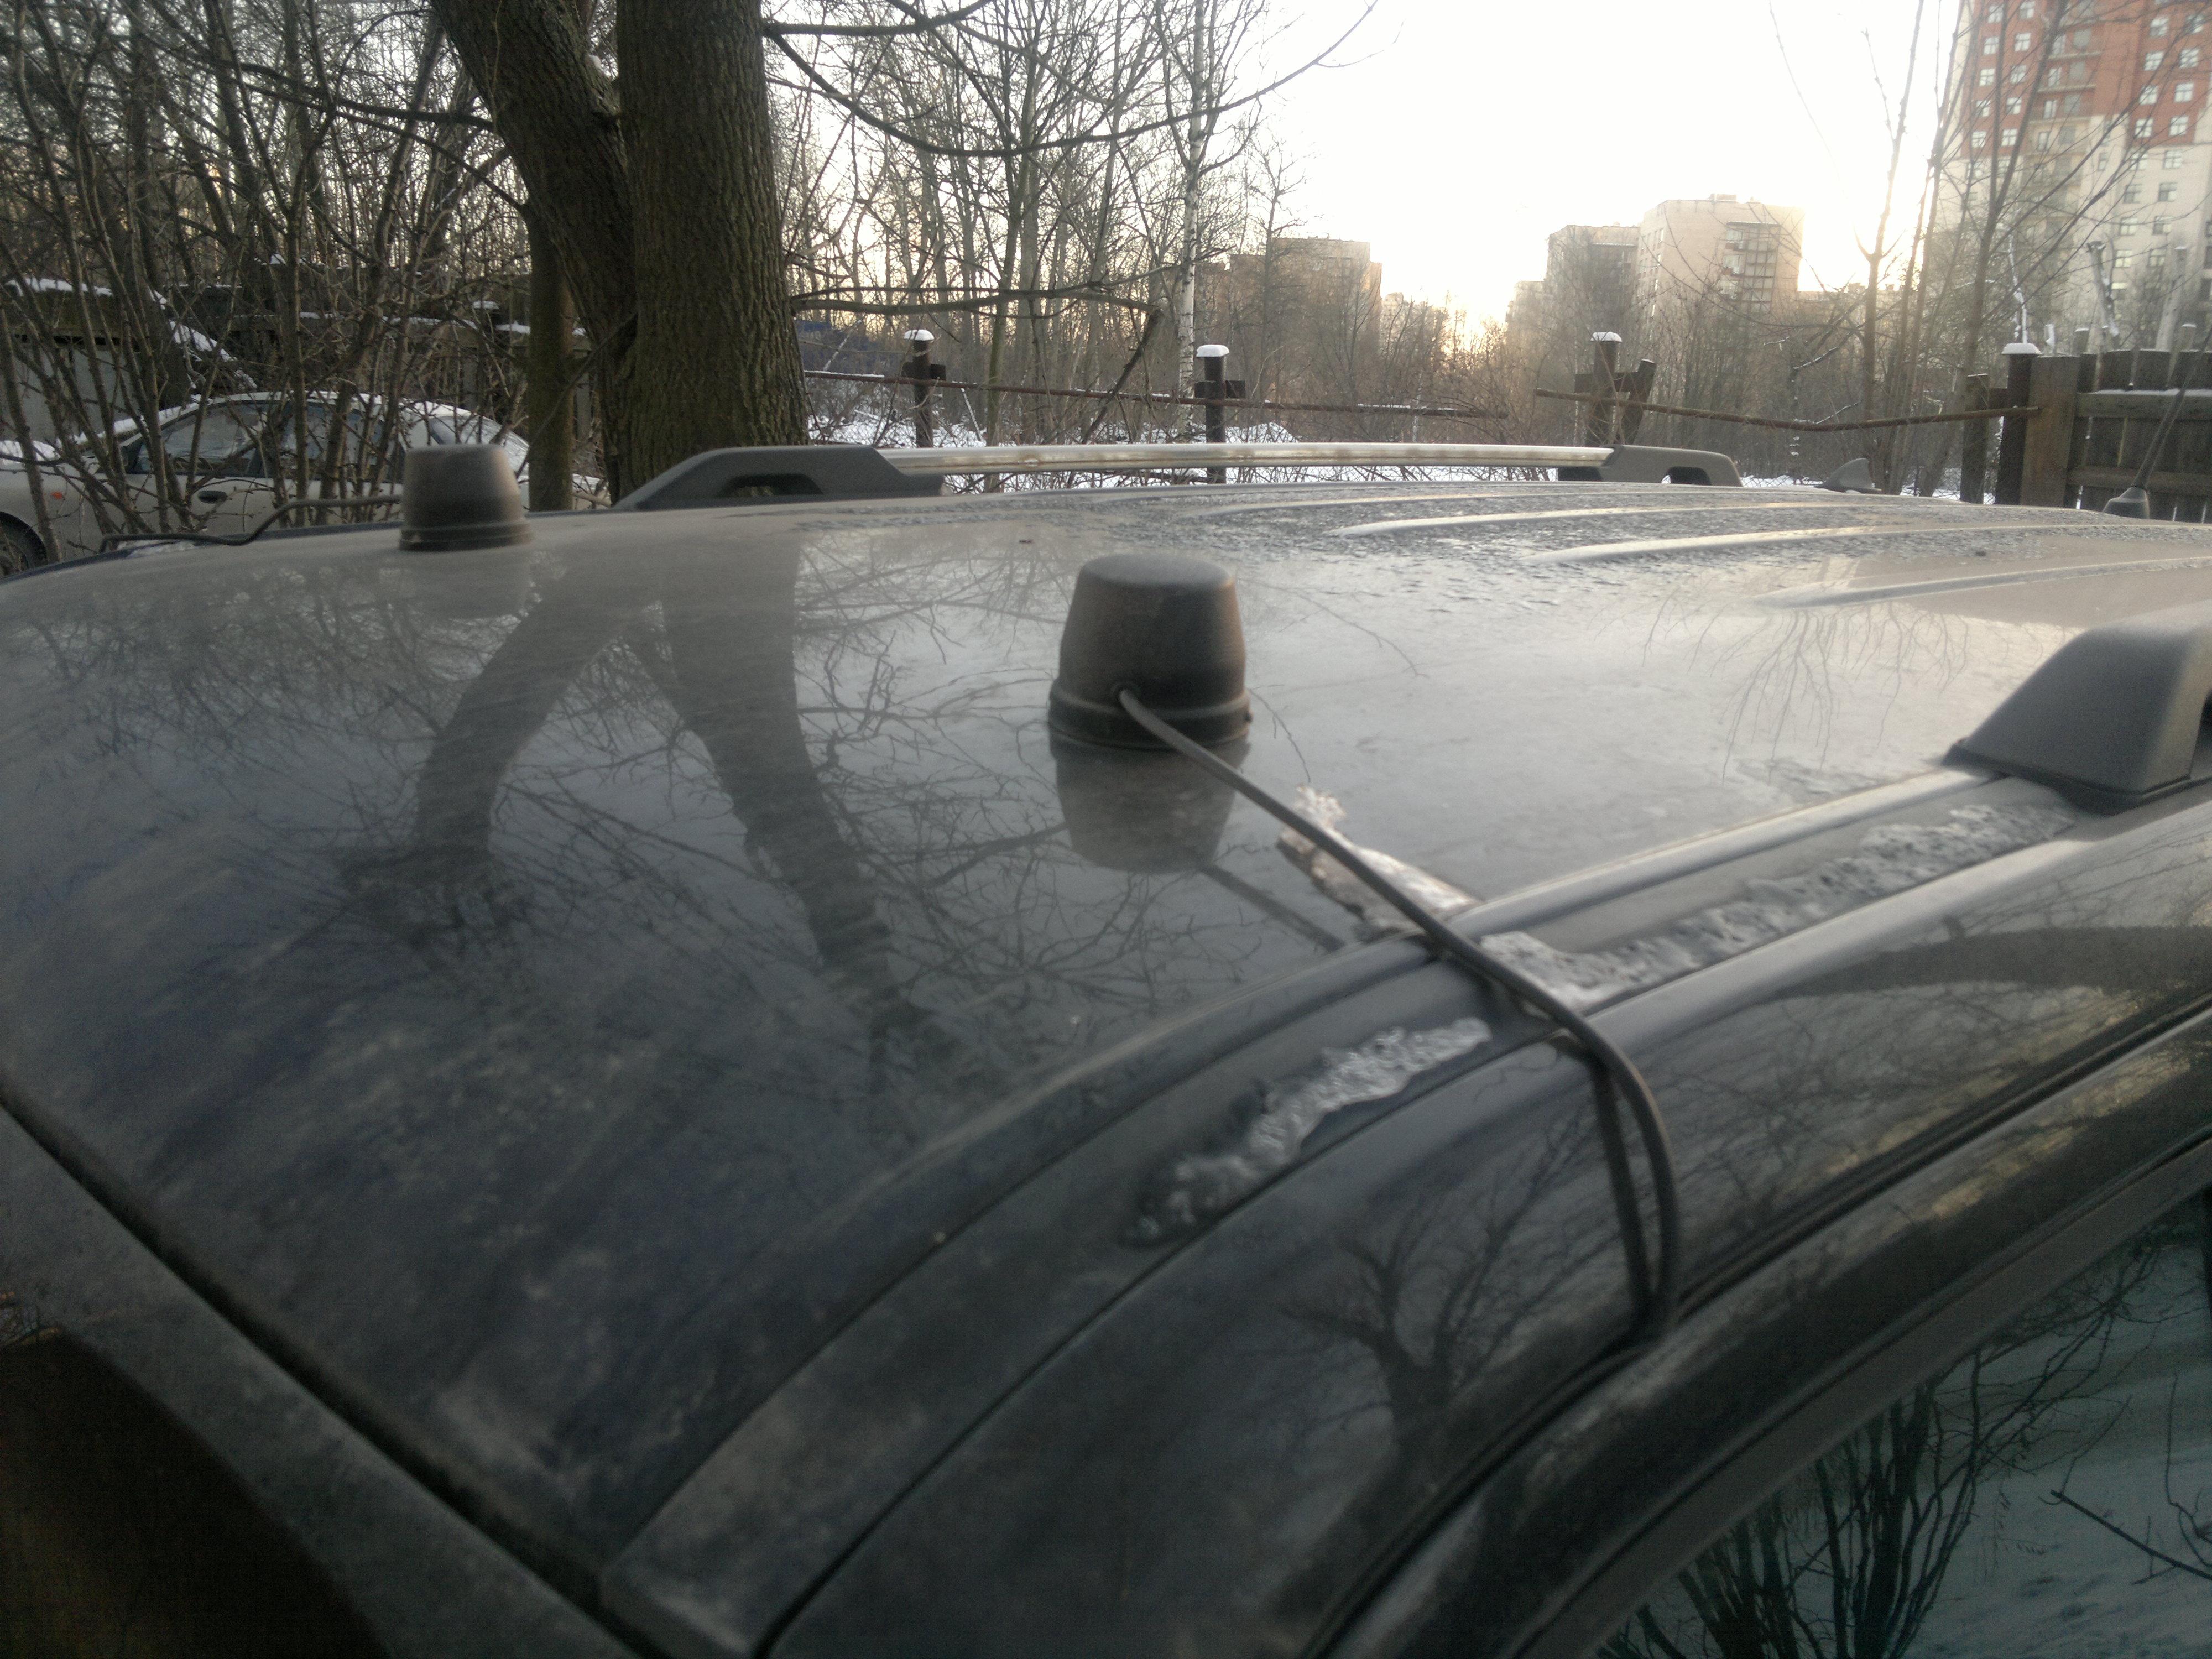 Автомобильная тв антенна своим автомобильная тв антенна своими руками фото 508